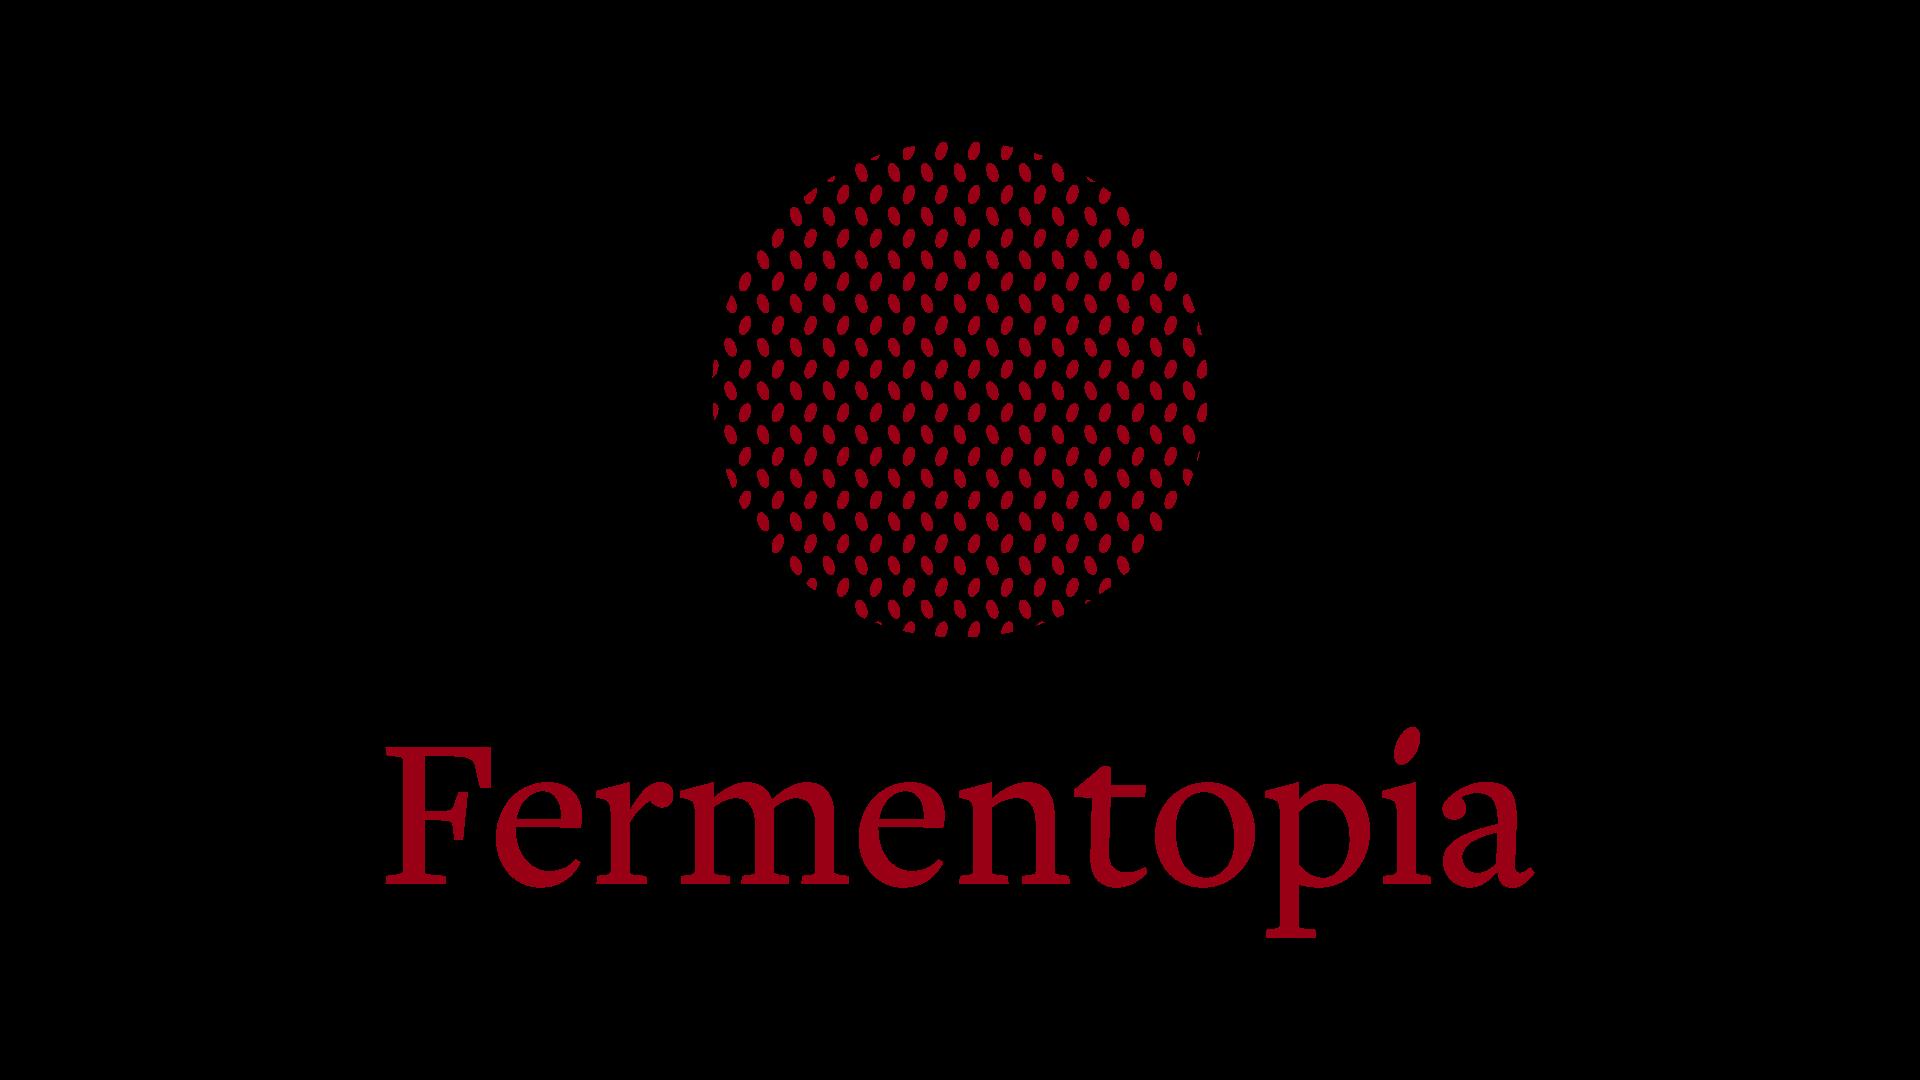 FERMENTOPIA — BRANDING 2018